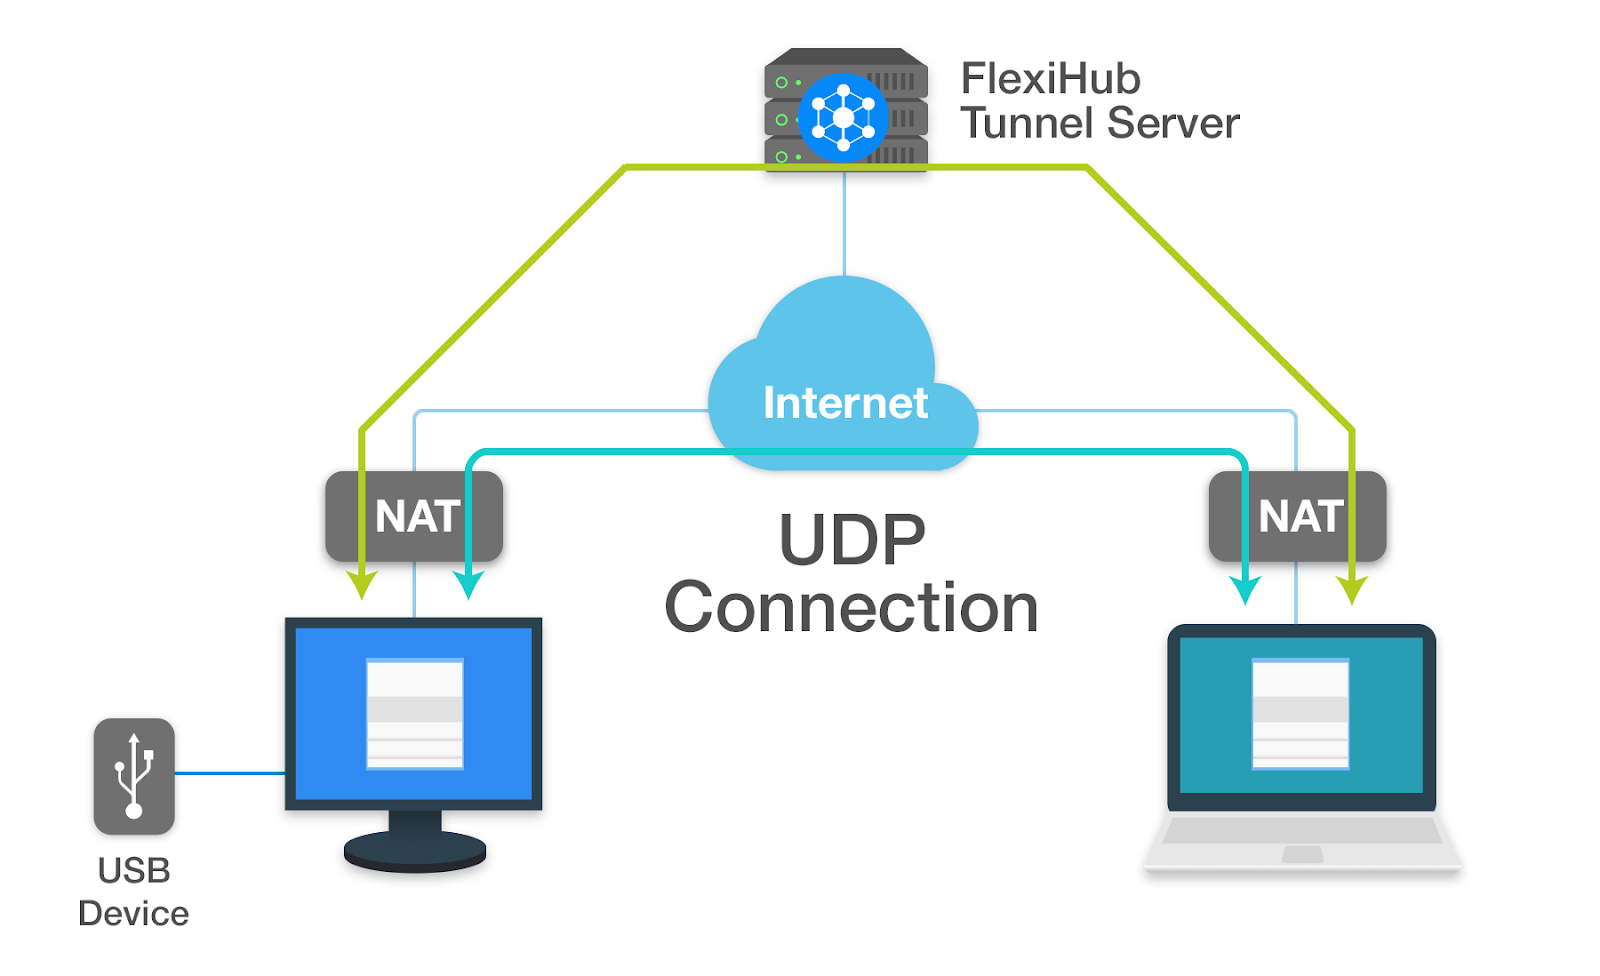 UDP connection or Tunnel Server